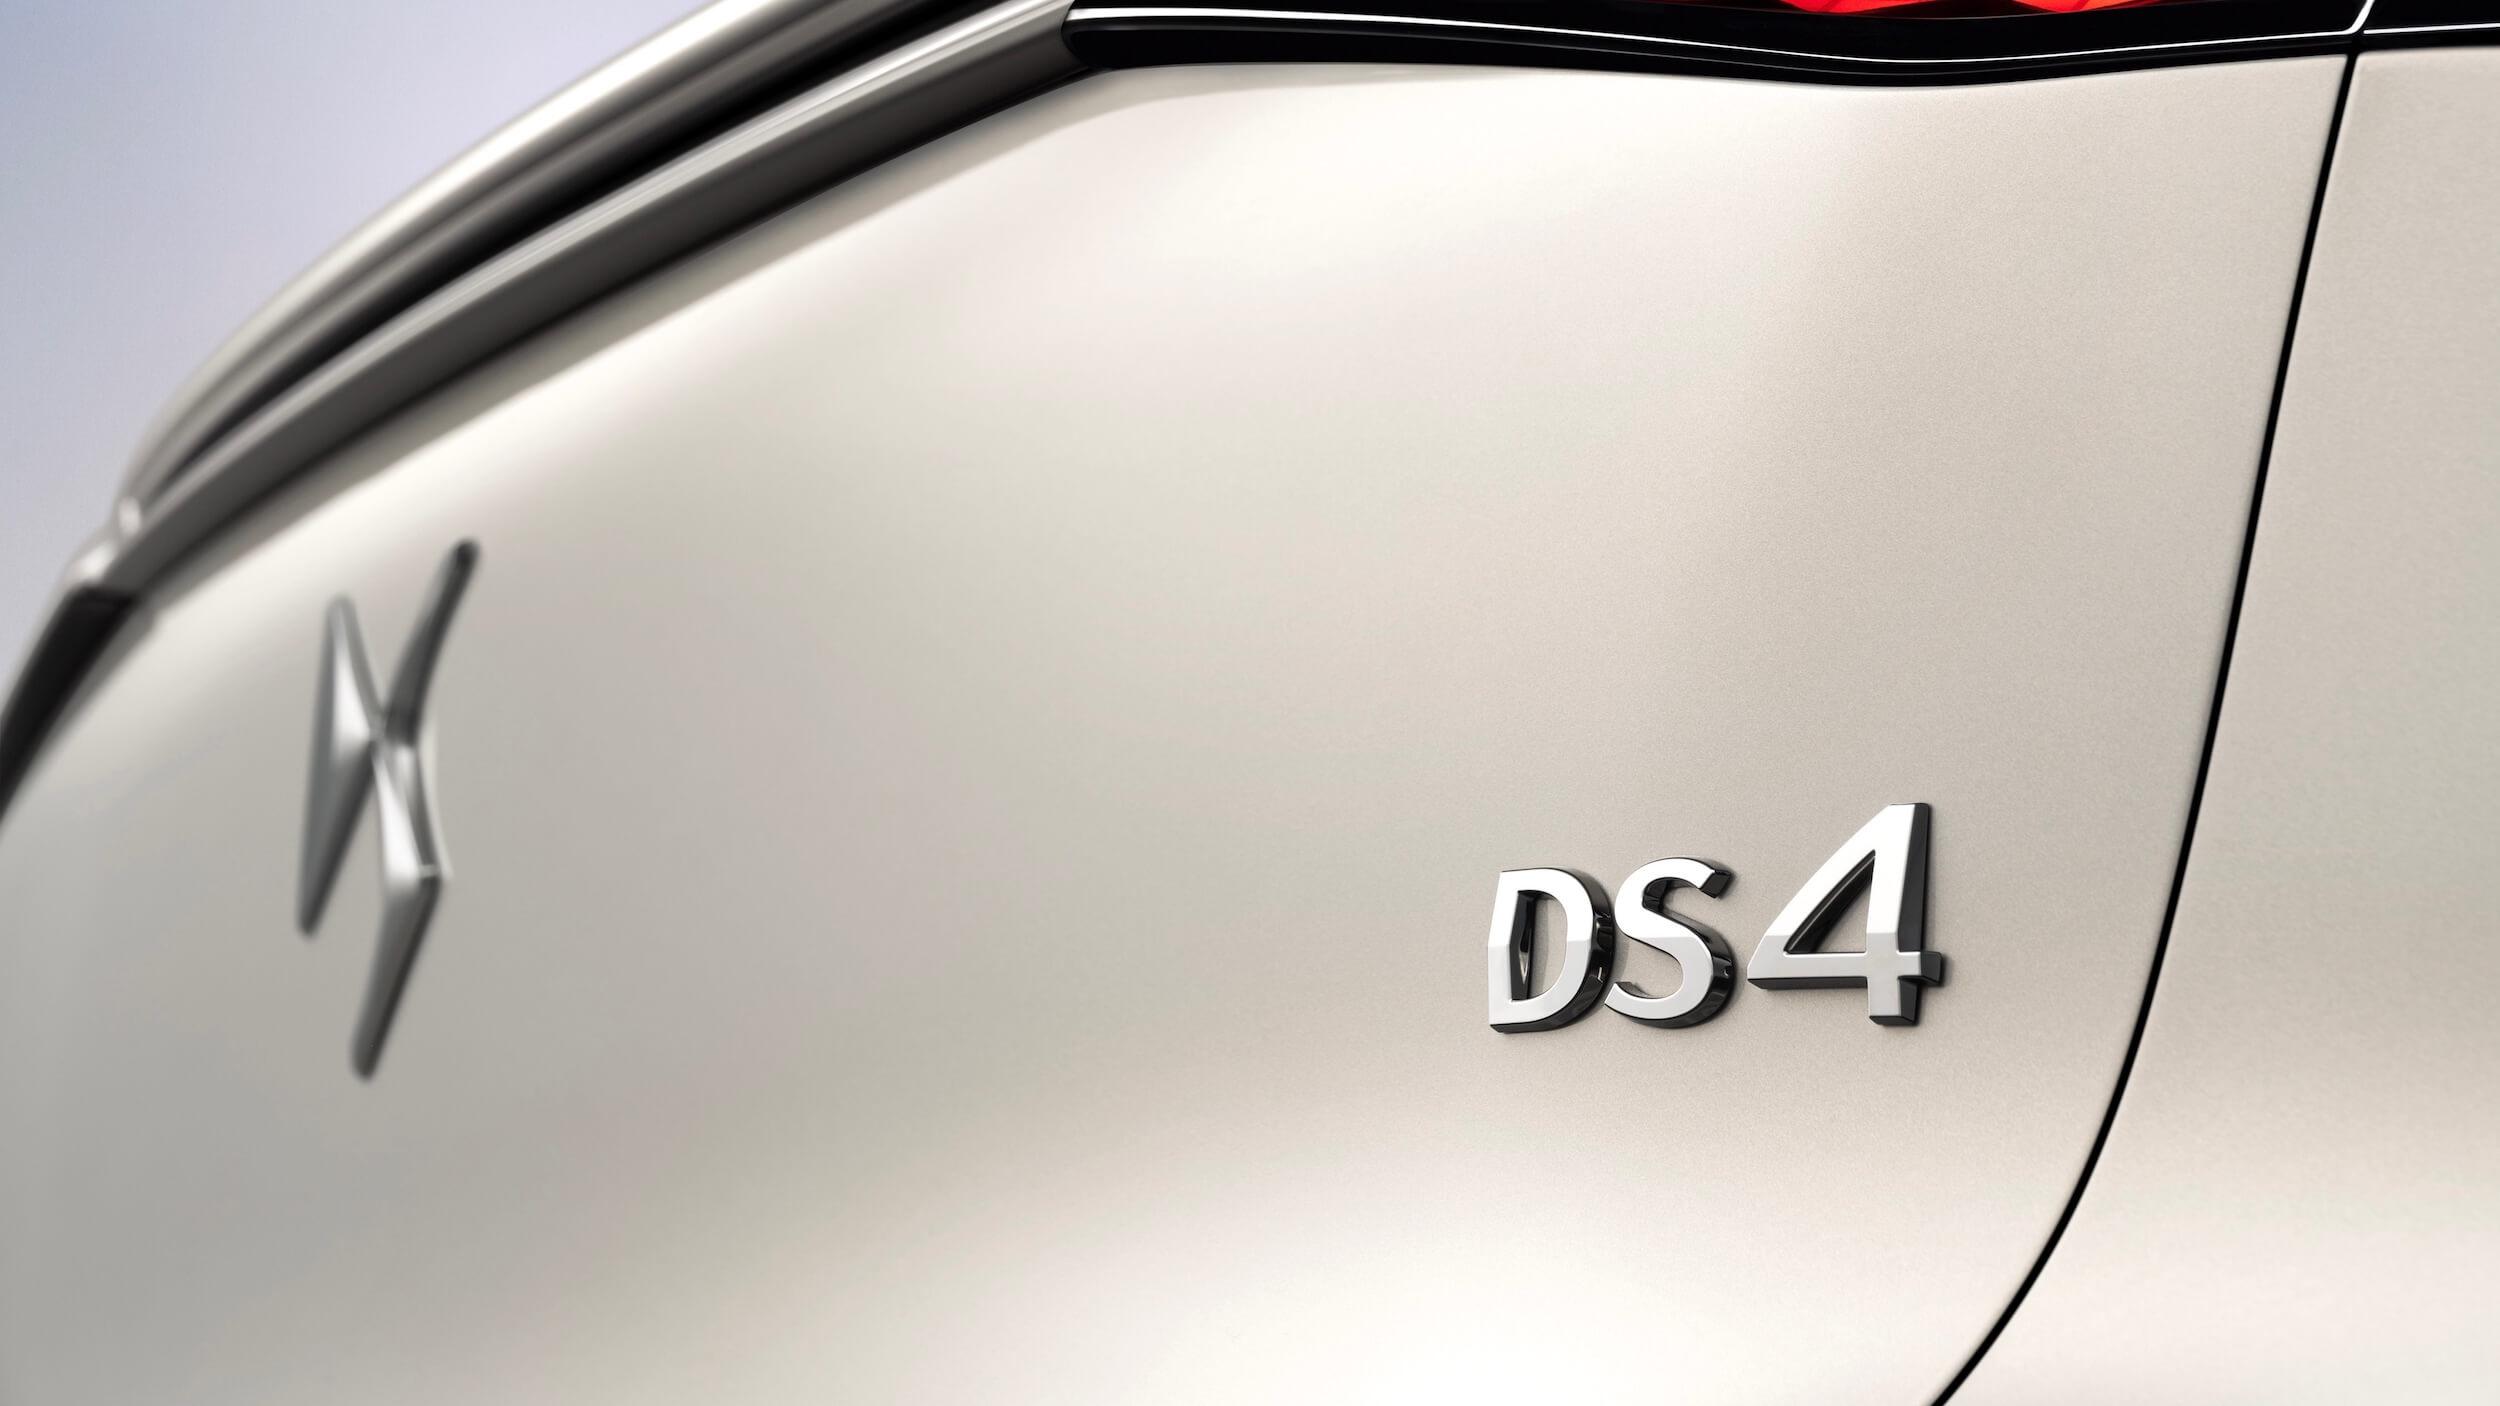 DS4 E Tense DS4 badge